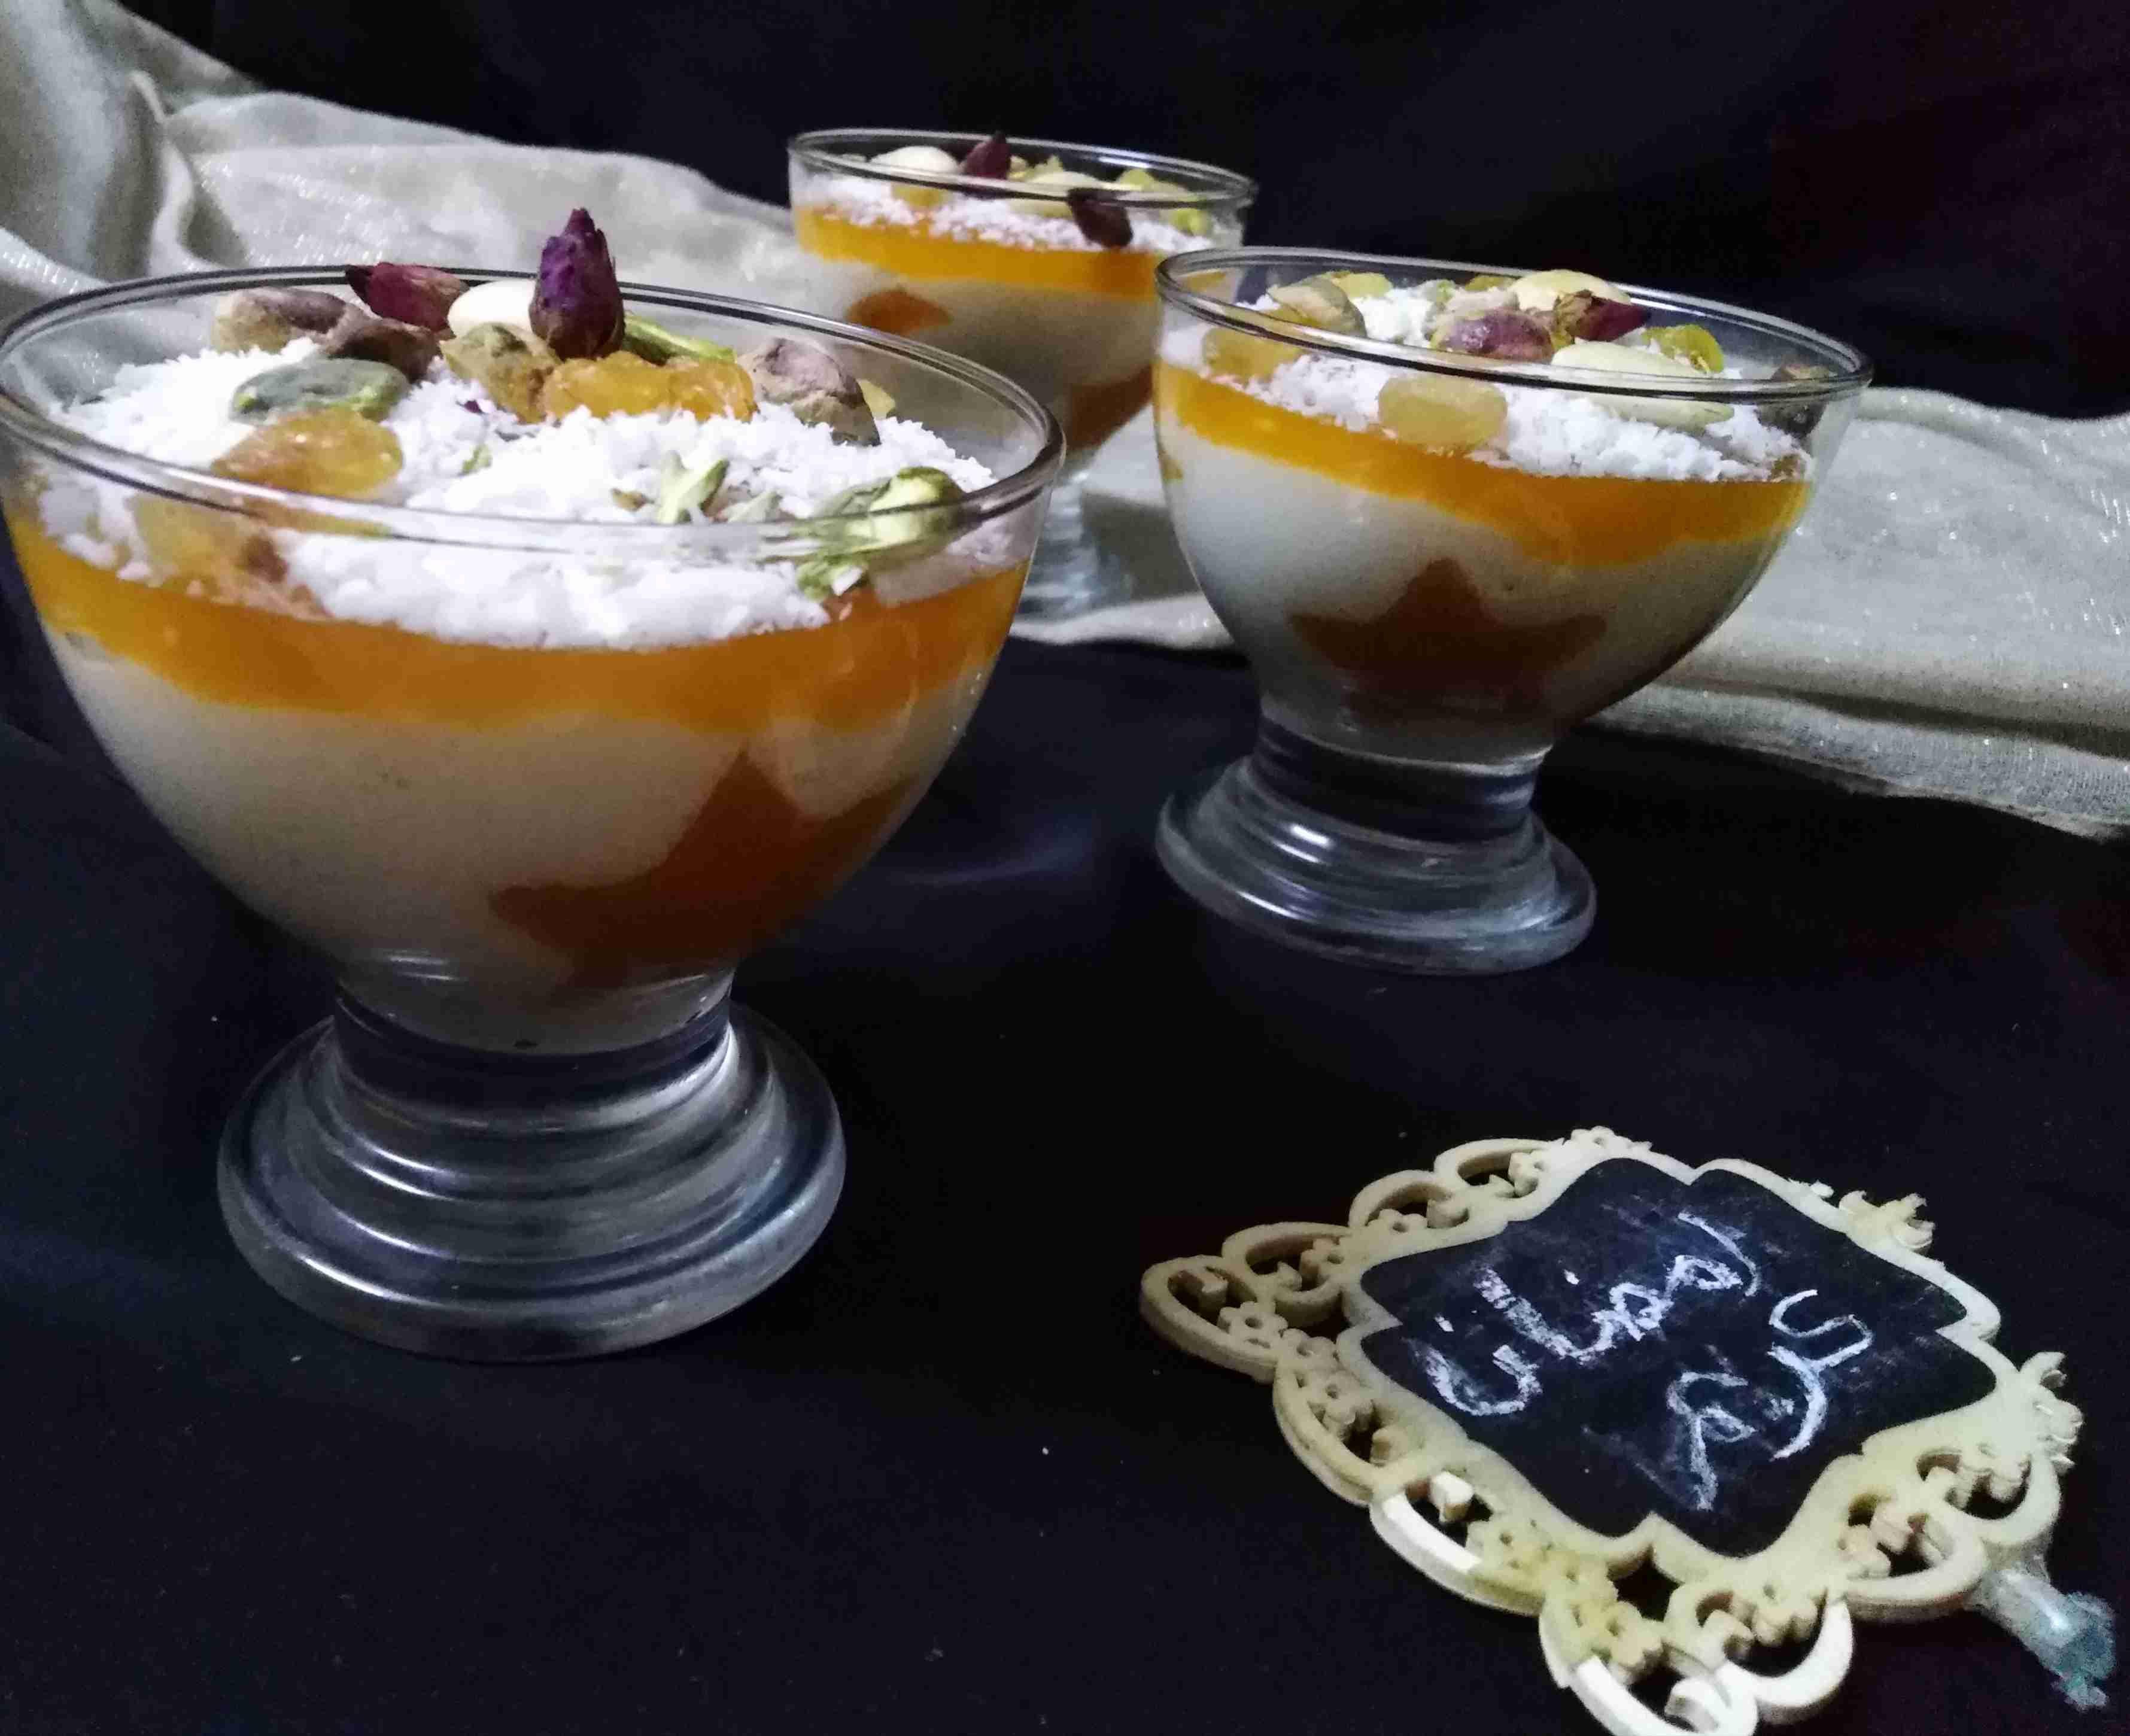 ليالي لبنان مع طبقة مهلبية قمر الدين ملكة رمضان زاكي Recipe Recipes Cooking Recipes Food